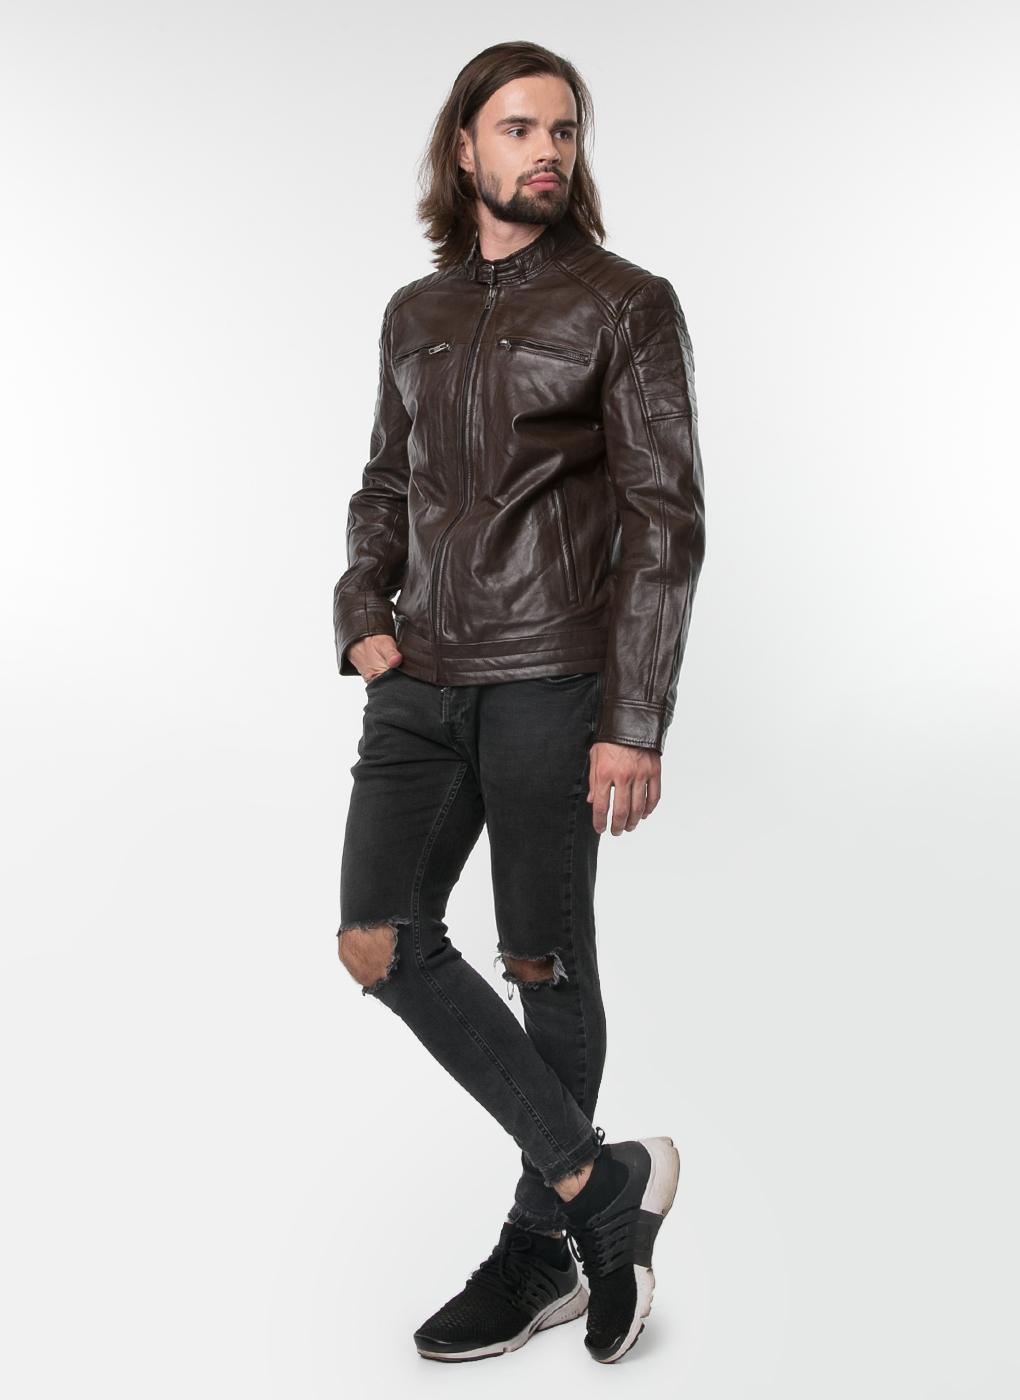 Кожаная куртка мужская 04, Gotthold фото